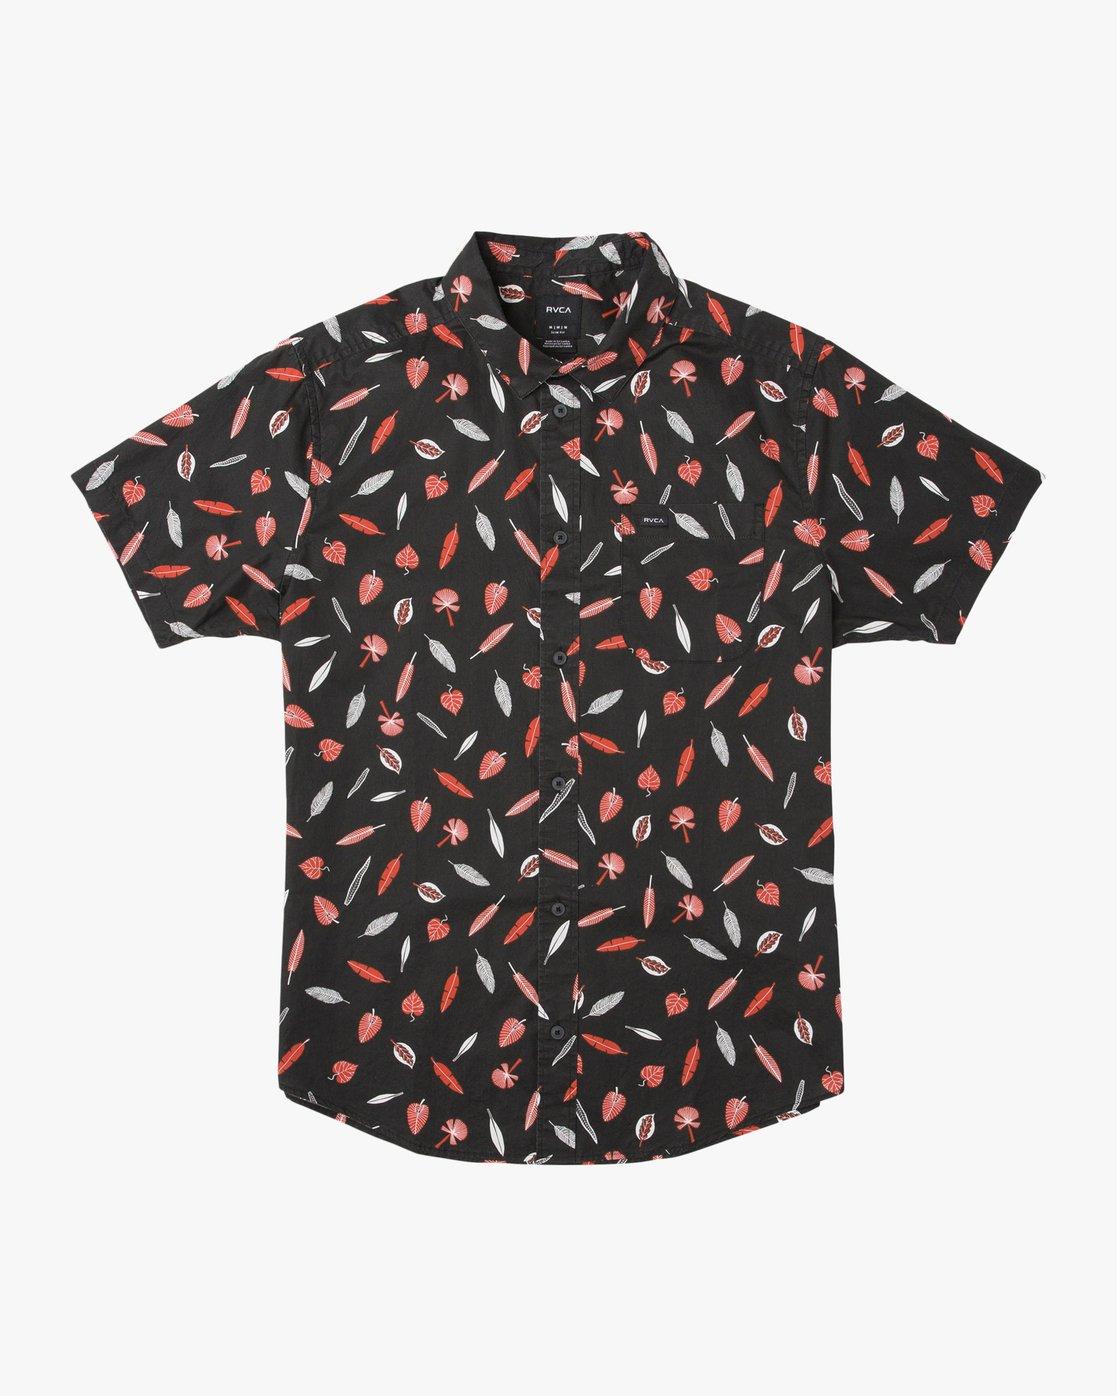 0 Tom Gerrard Button-Up Shirt Black M503TRTG RVCA